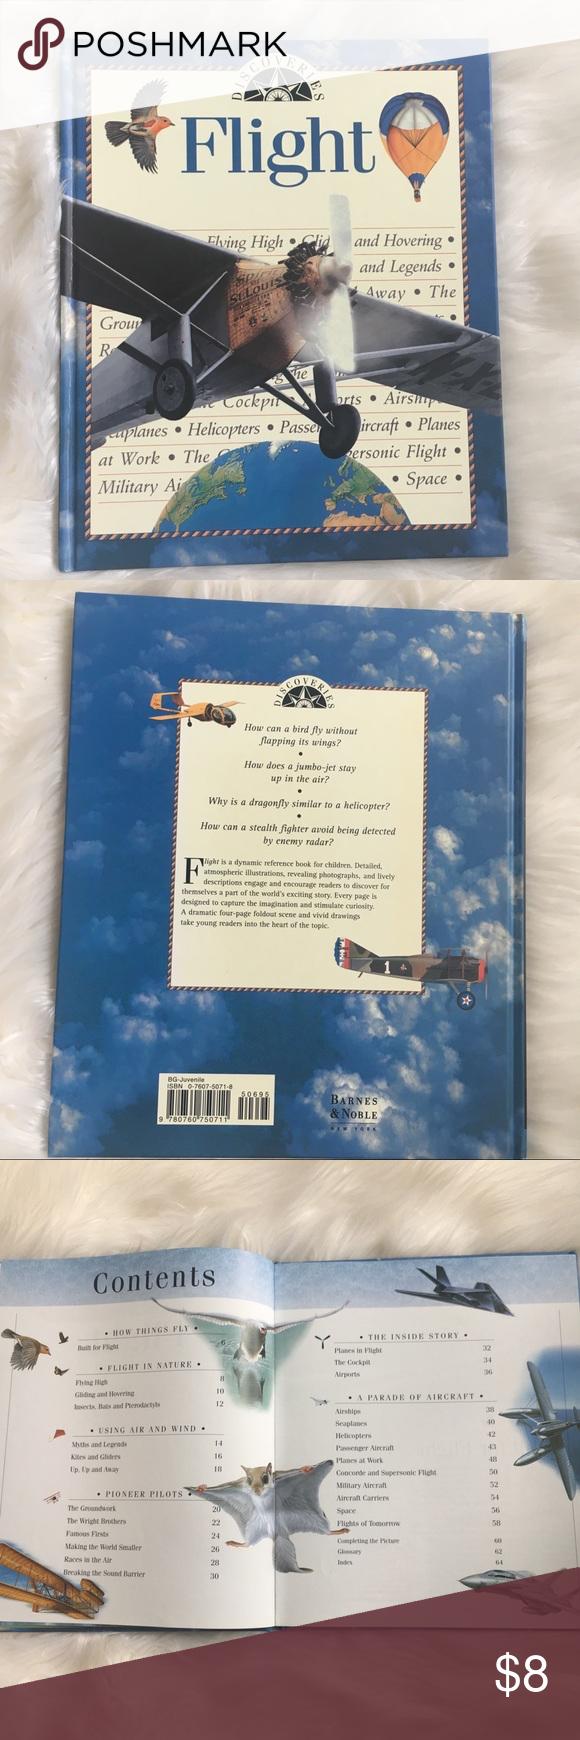 Flight Book Booking Flights Books Coffee Table Books